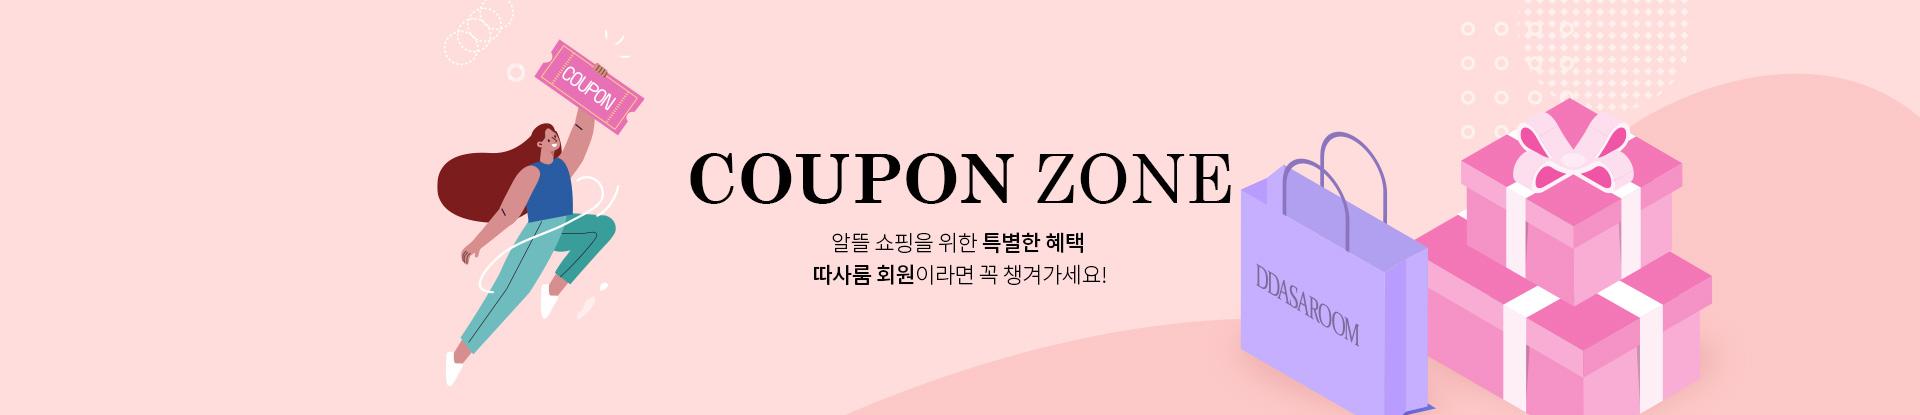 coupone zone